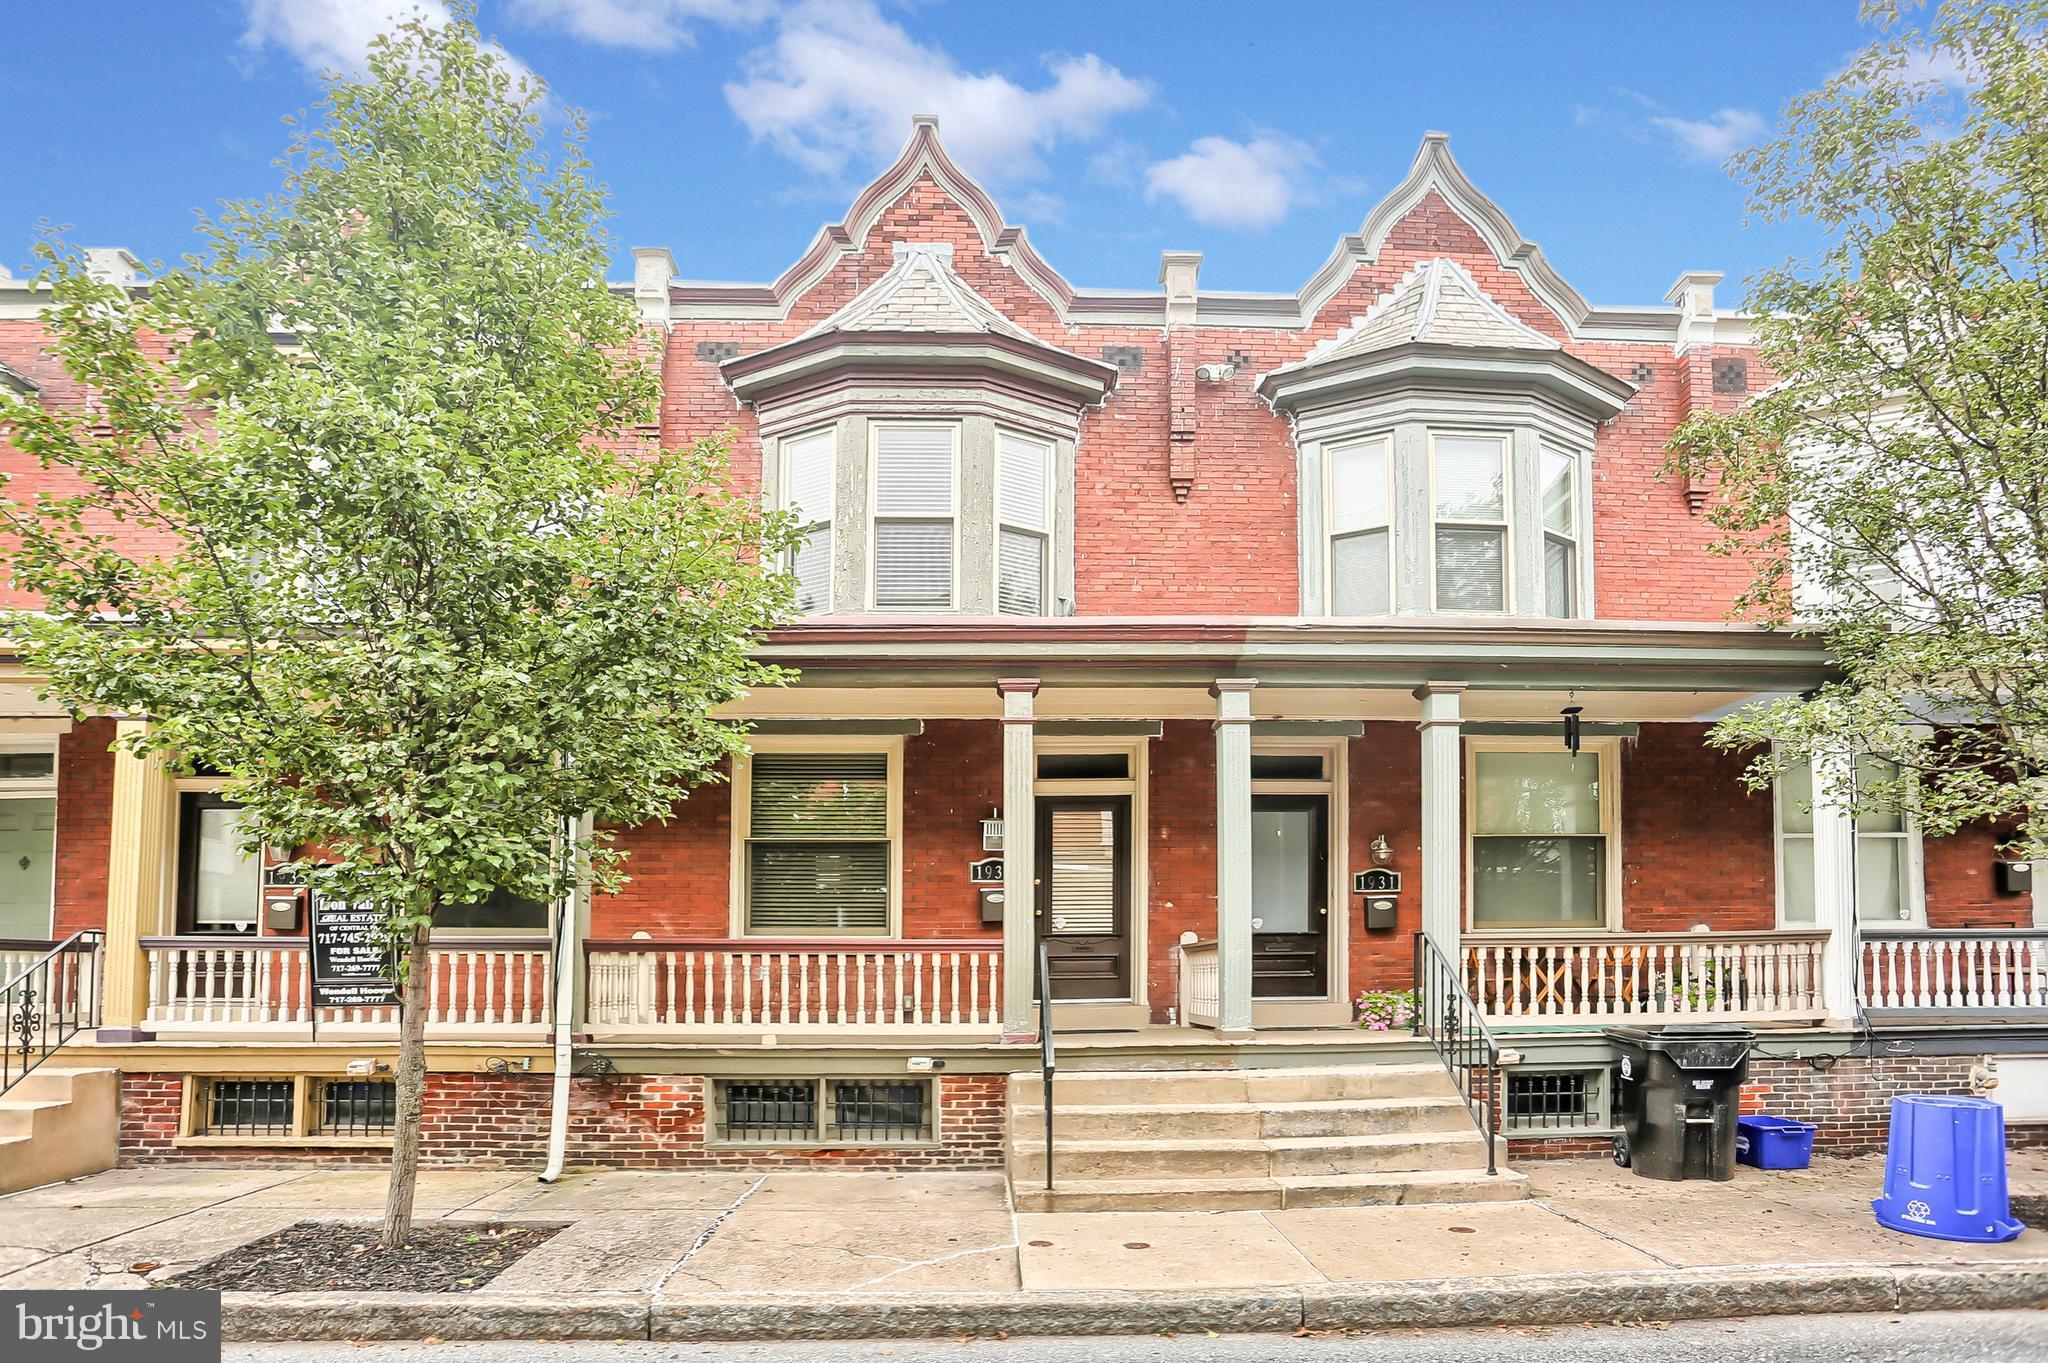 1933 PENN STREET, HARRISBURG, PA 17102